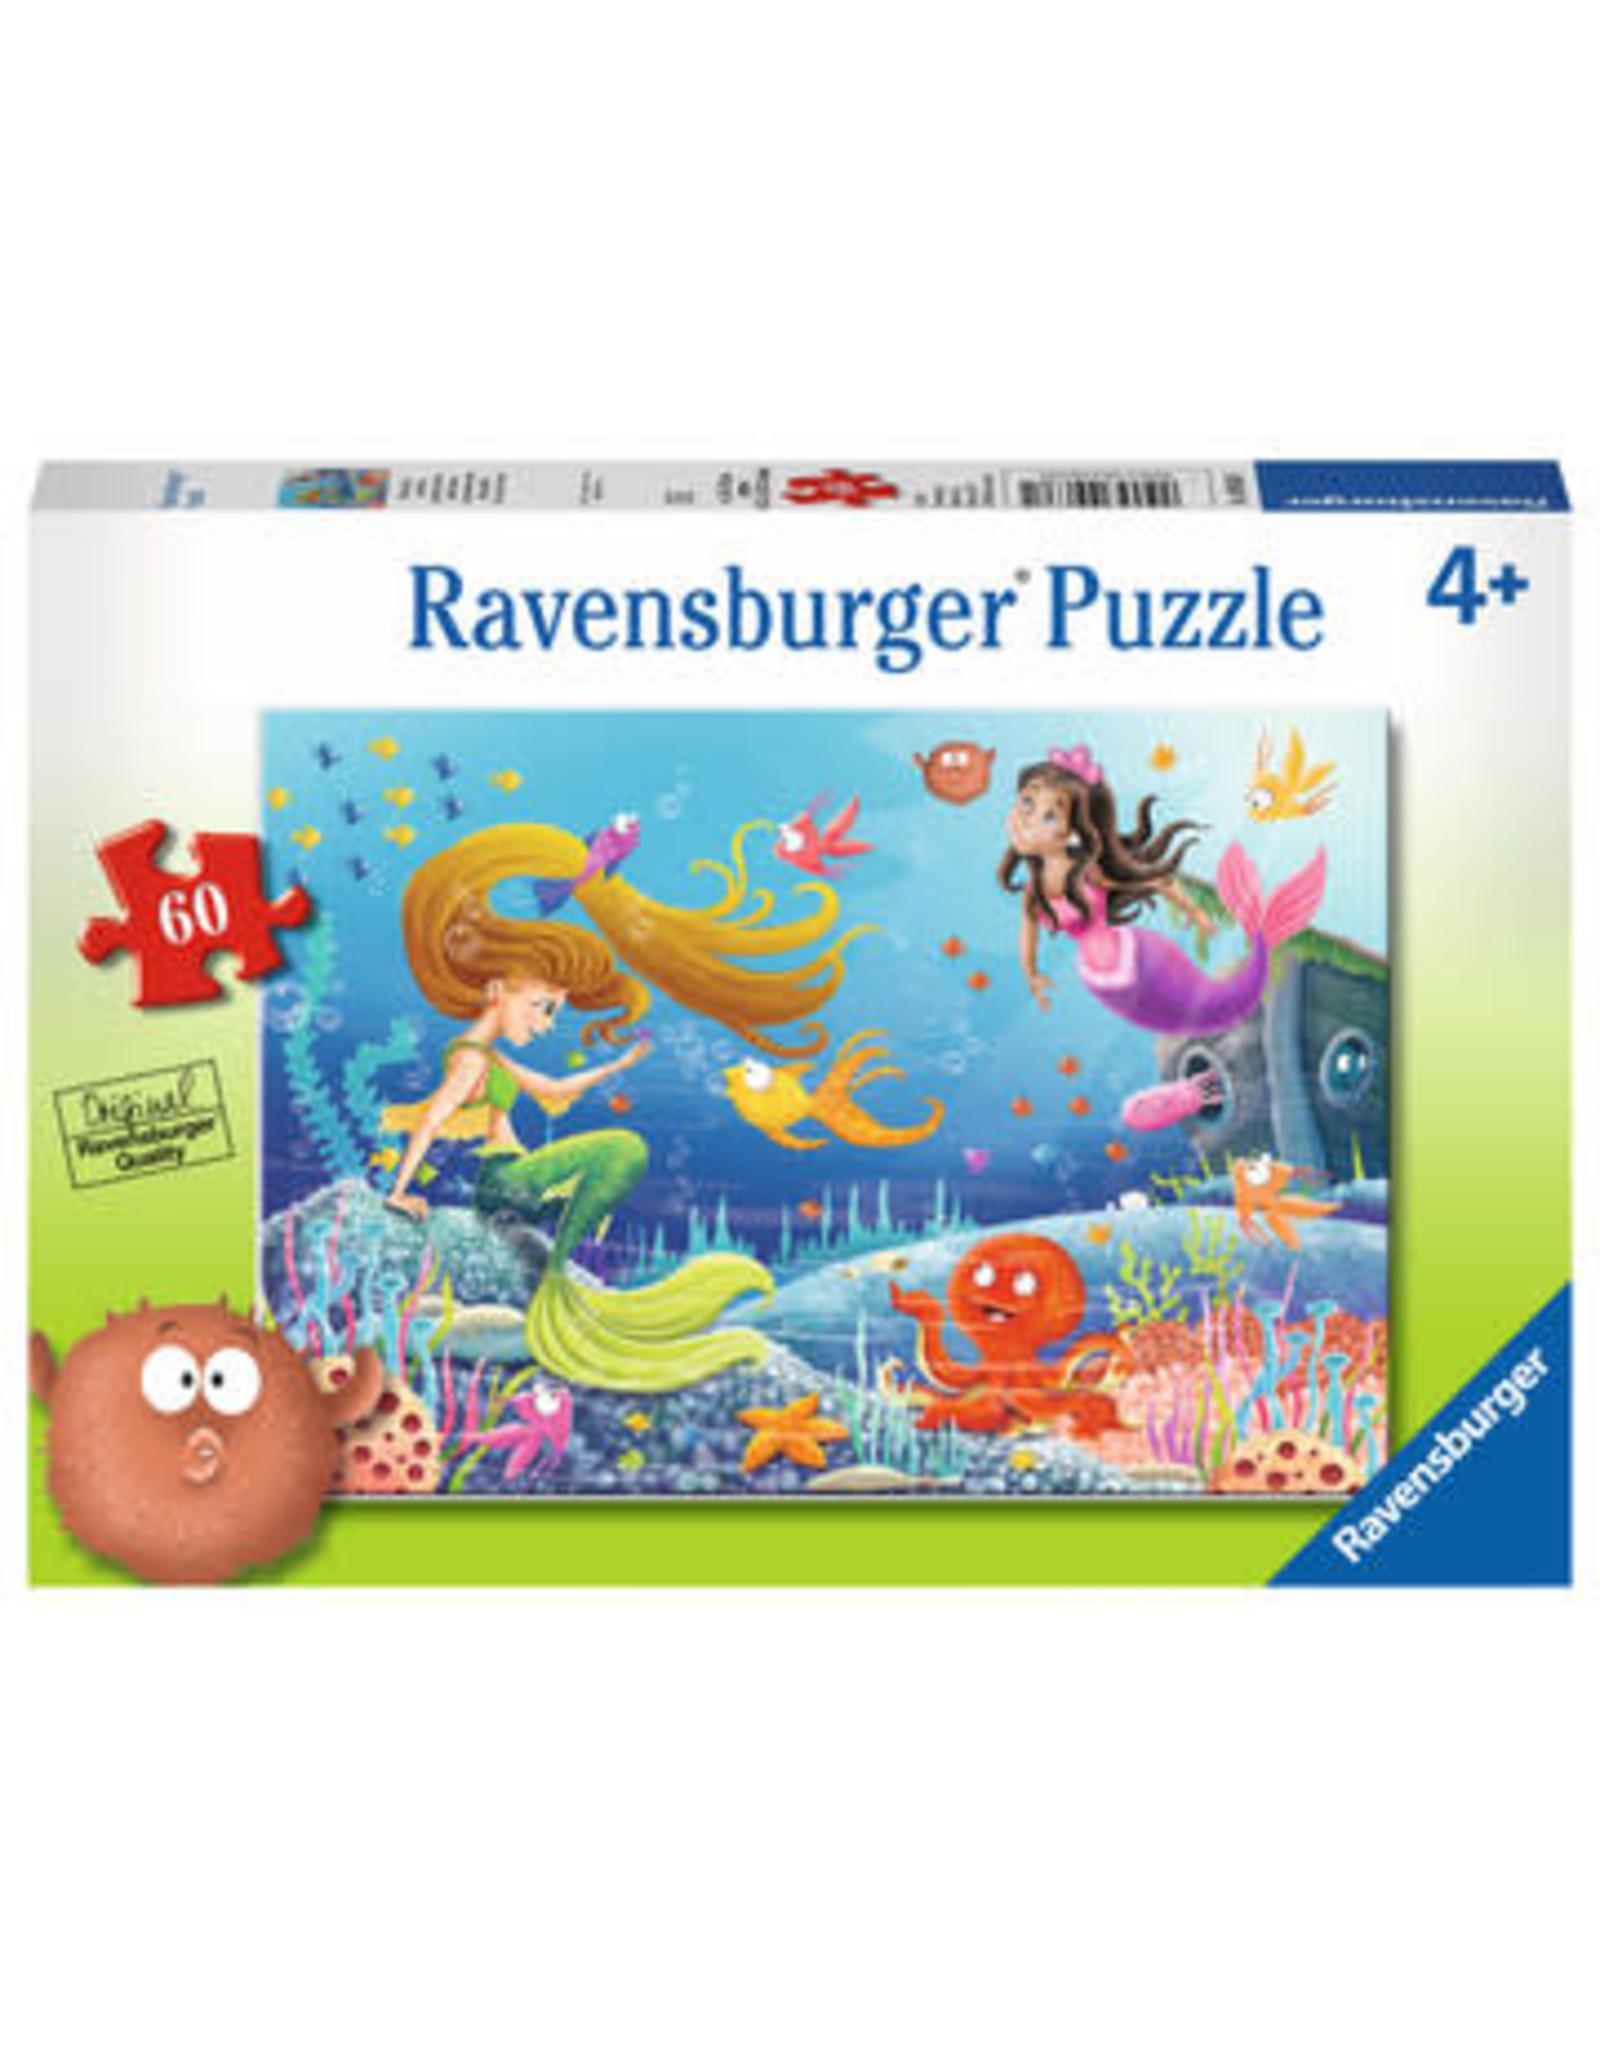 Ravensburger 60 pcs. Mermaid Tales Puzzle